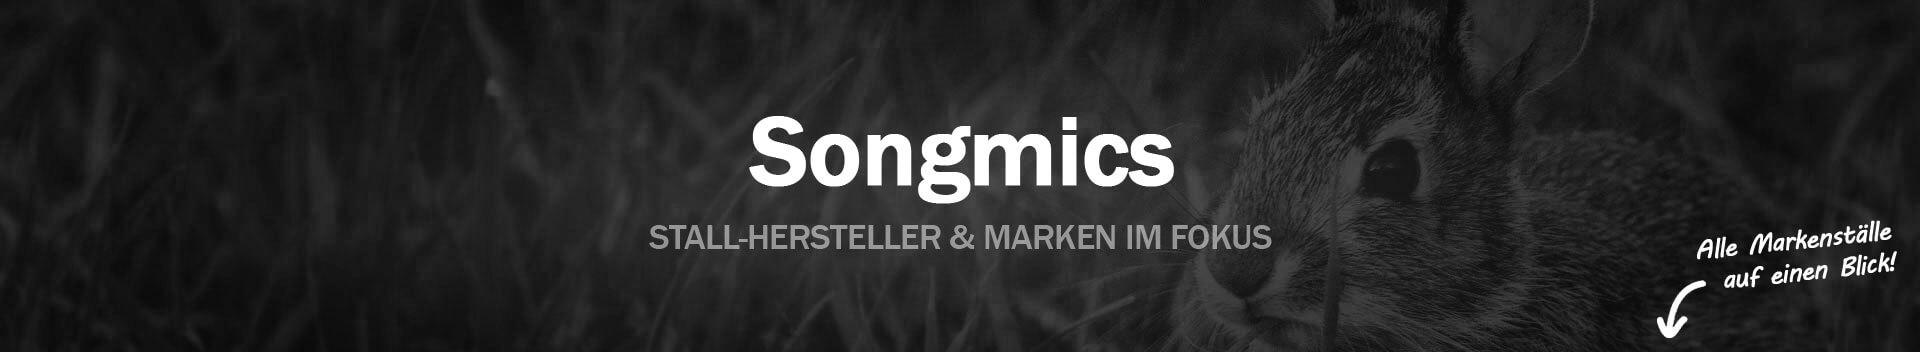 songmics-kaninchenstall-hersteller